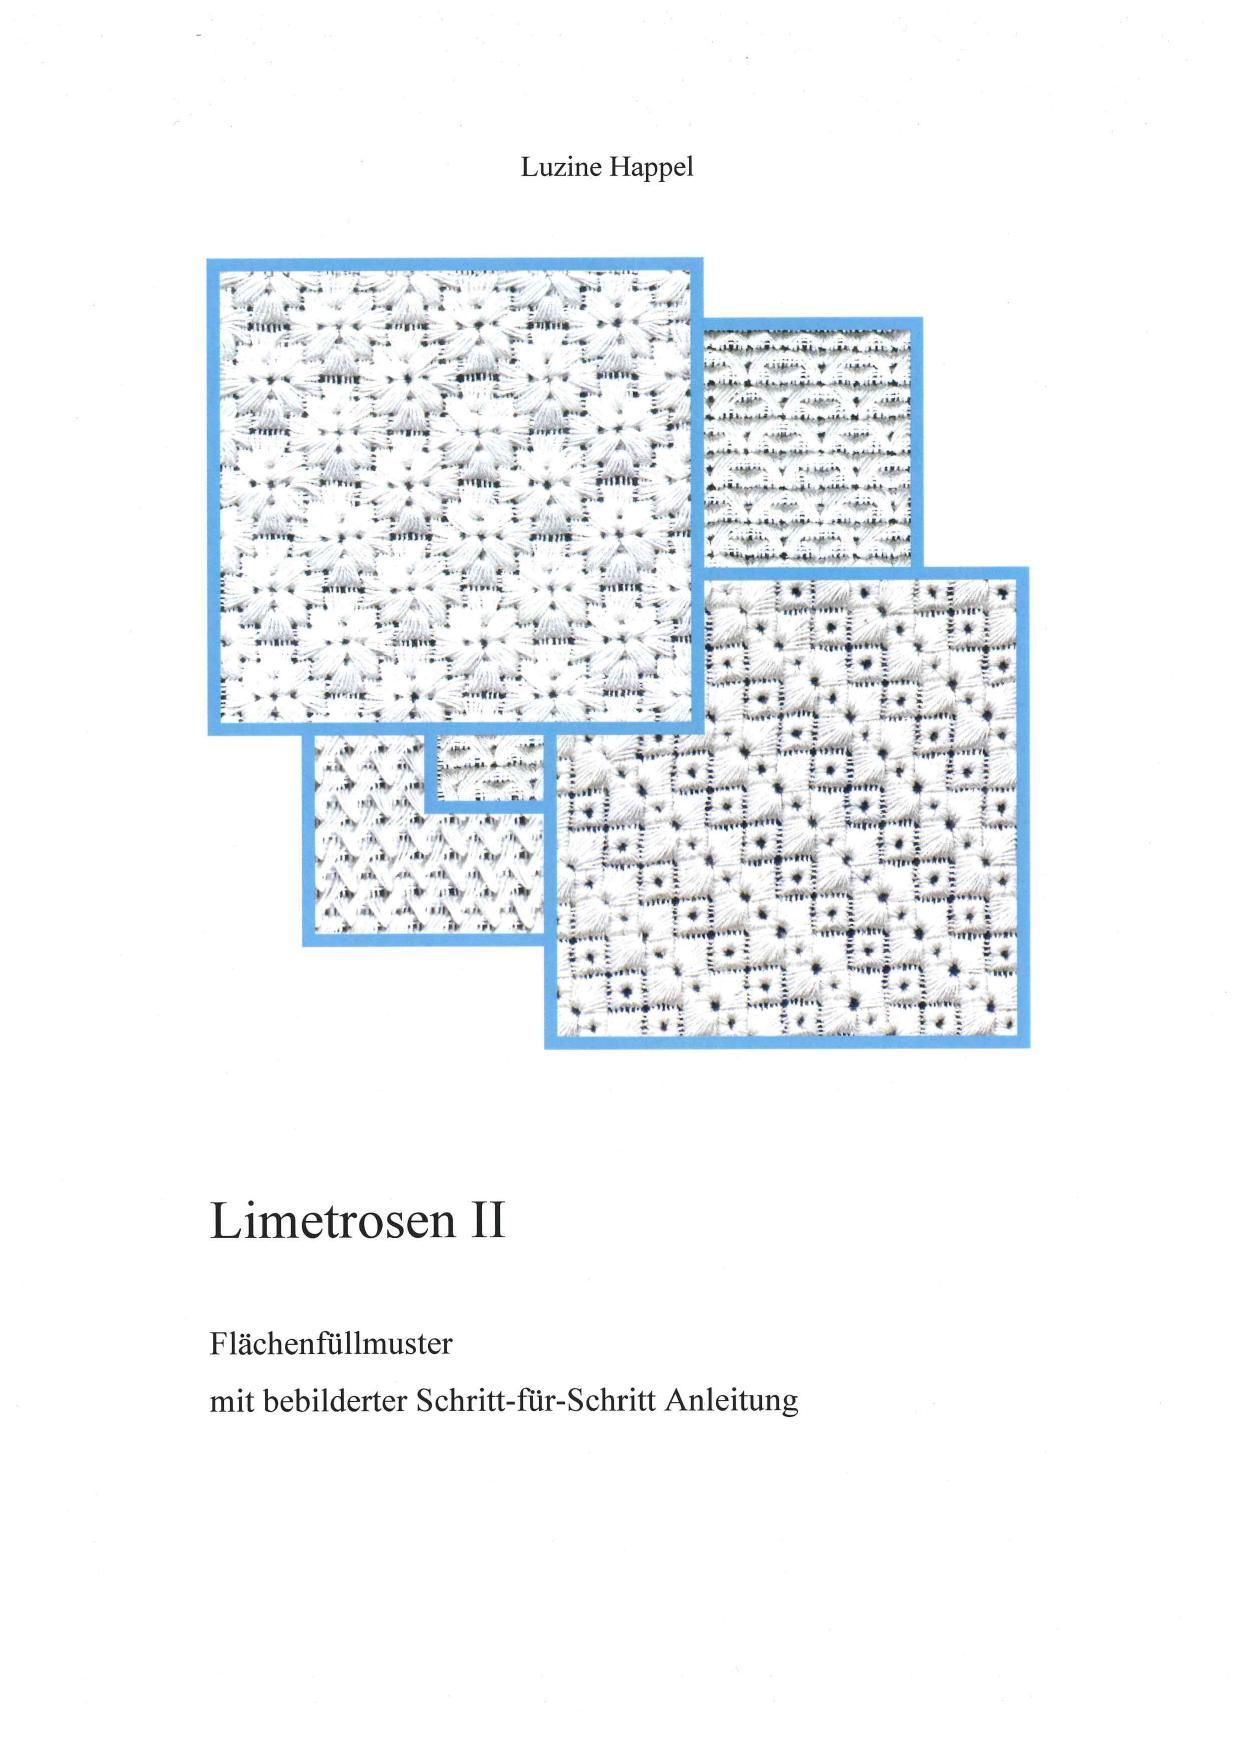 Limetrosen II 1 / 7